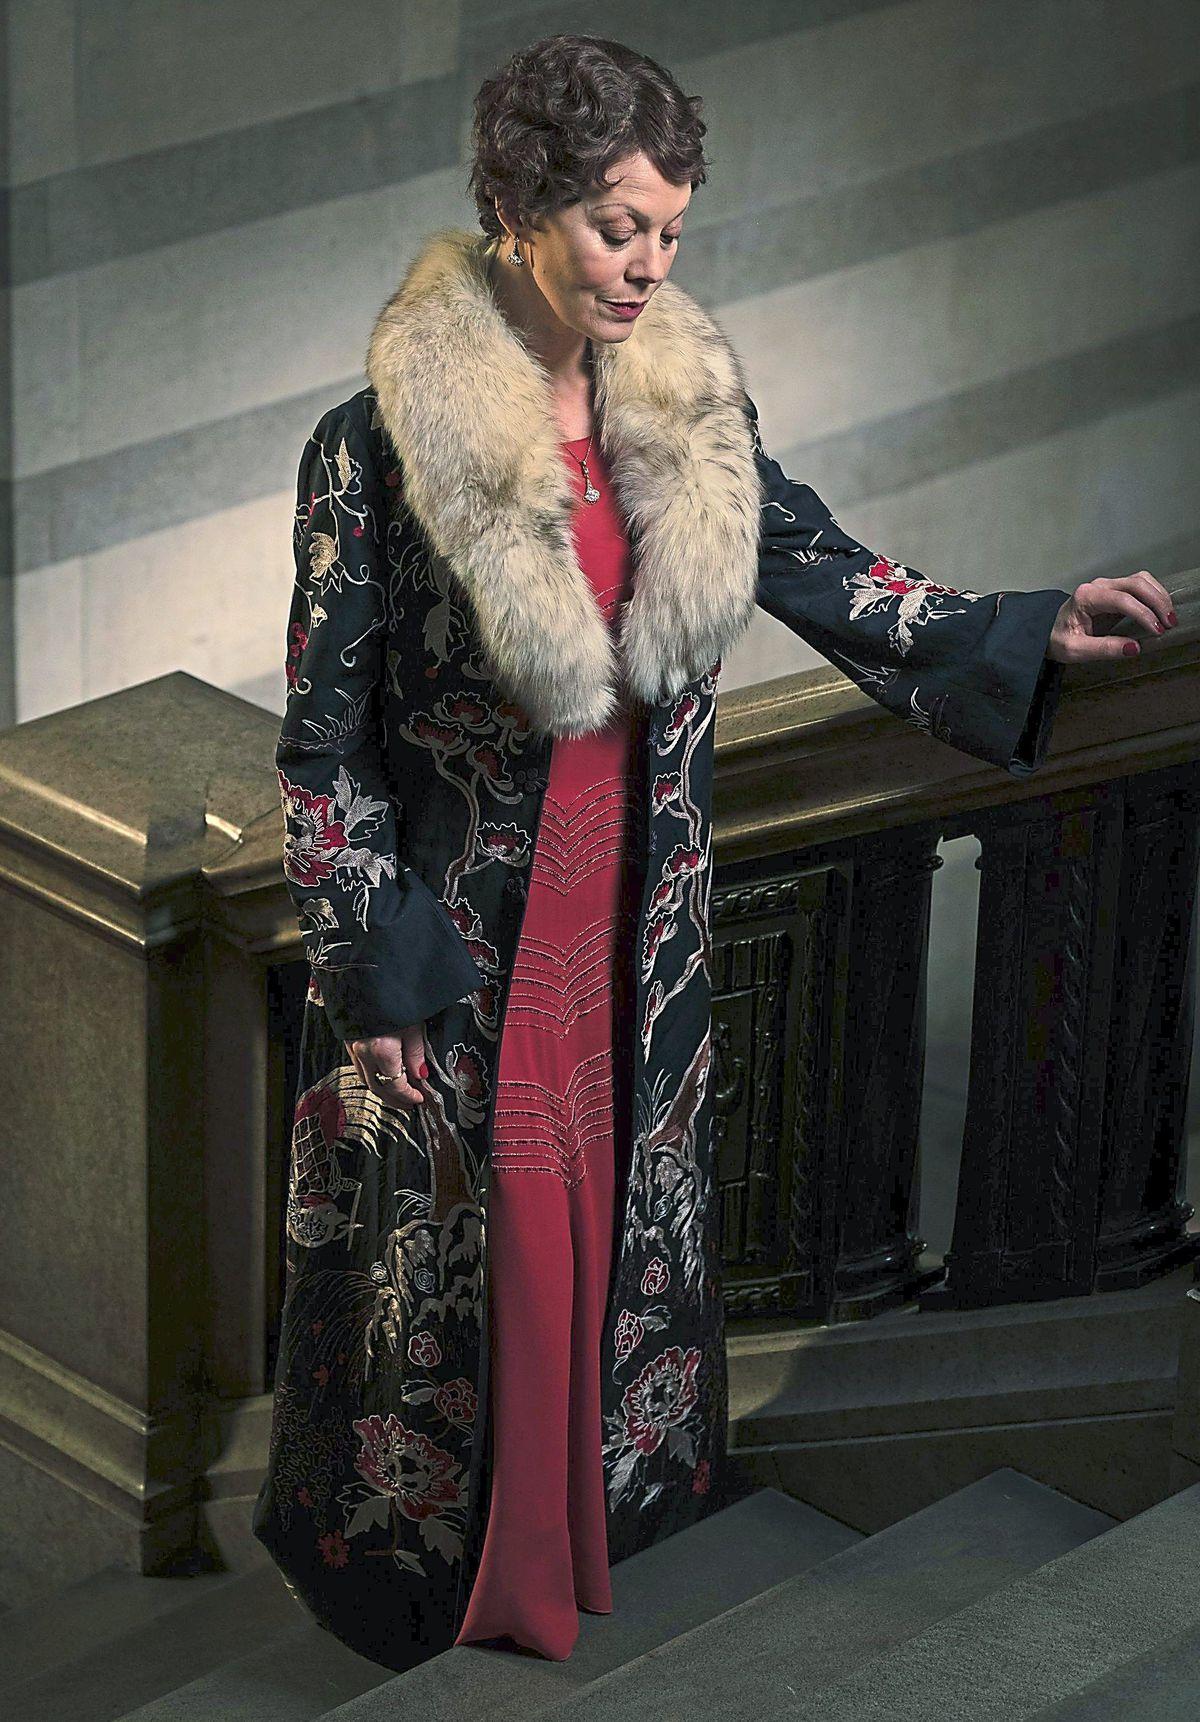 Helen McCrory as Polly Gray in Peaky Blinders. Pic: Matt Squire